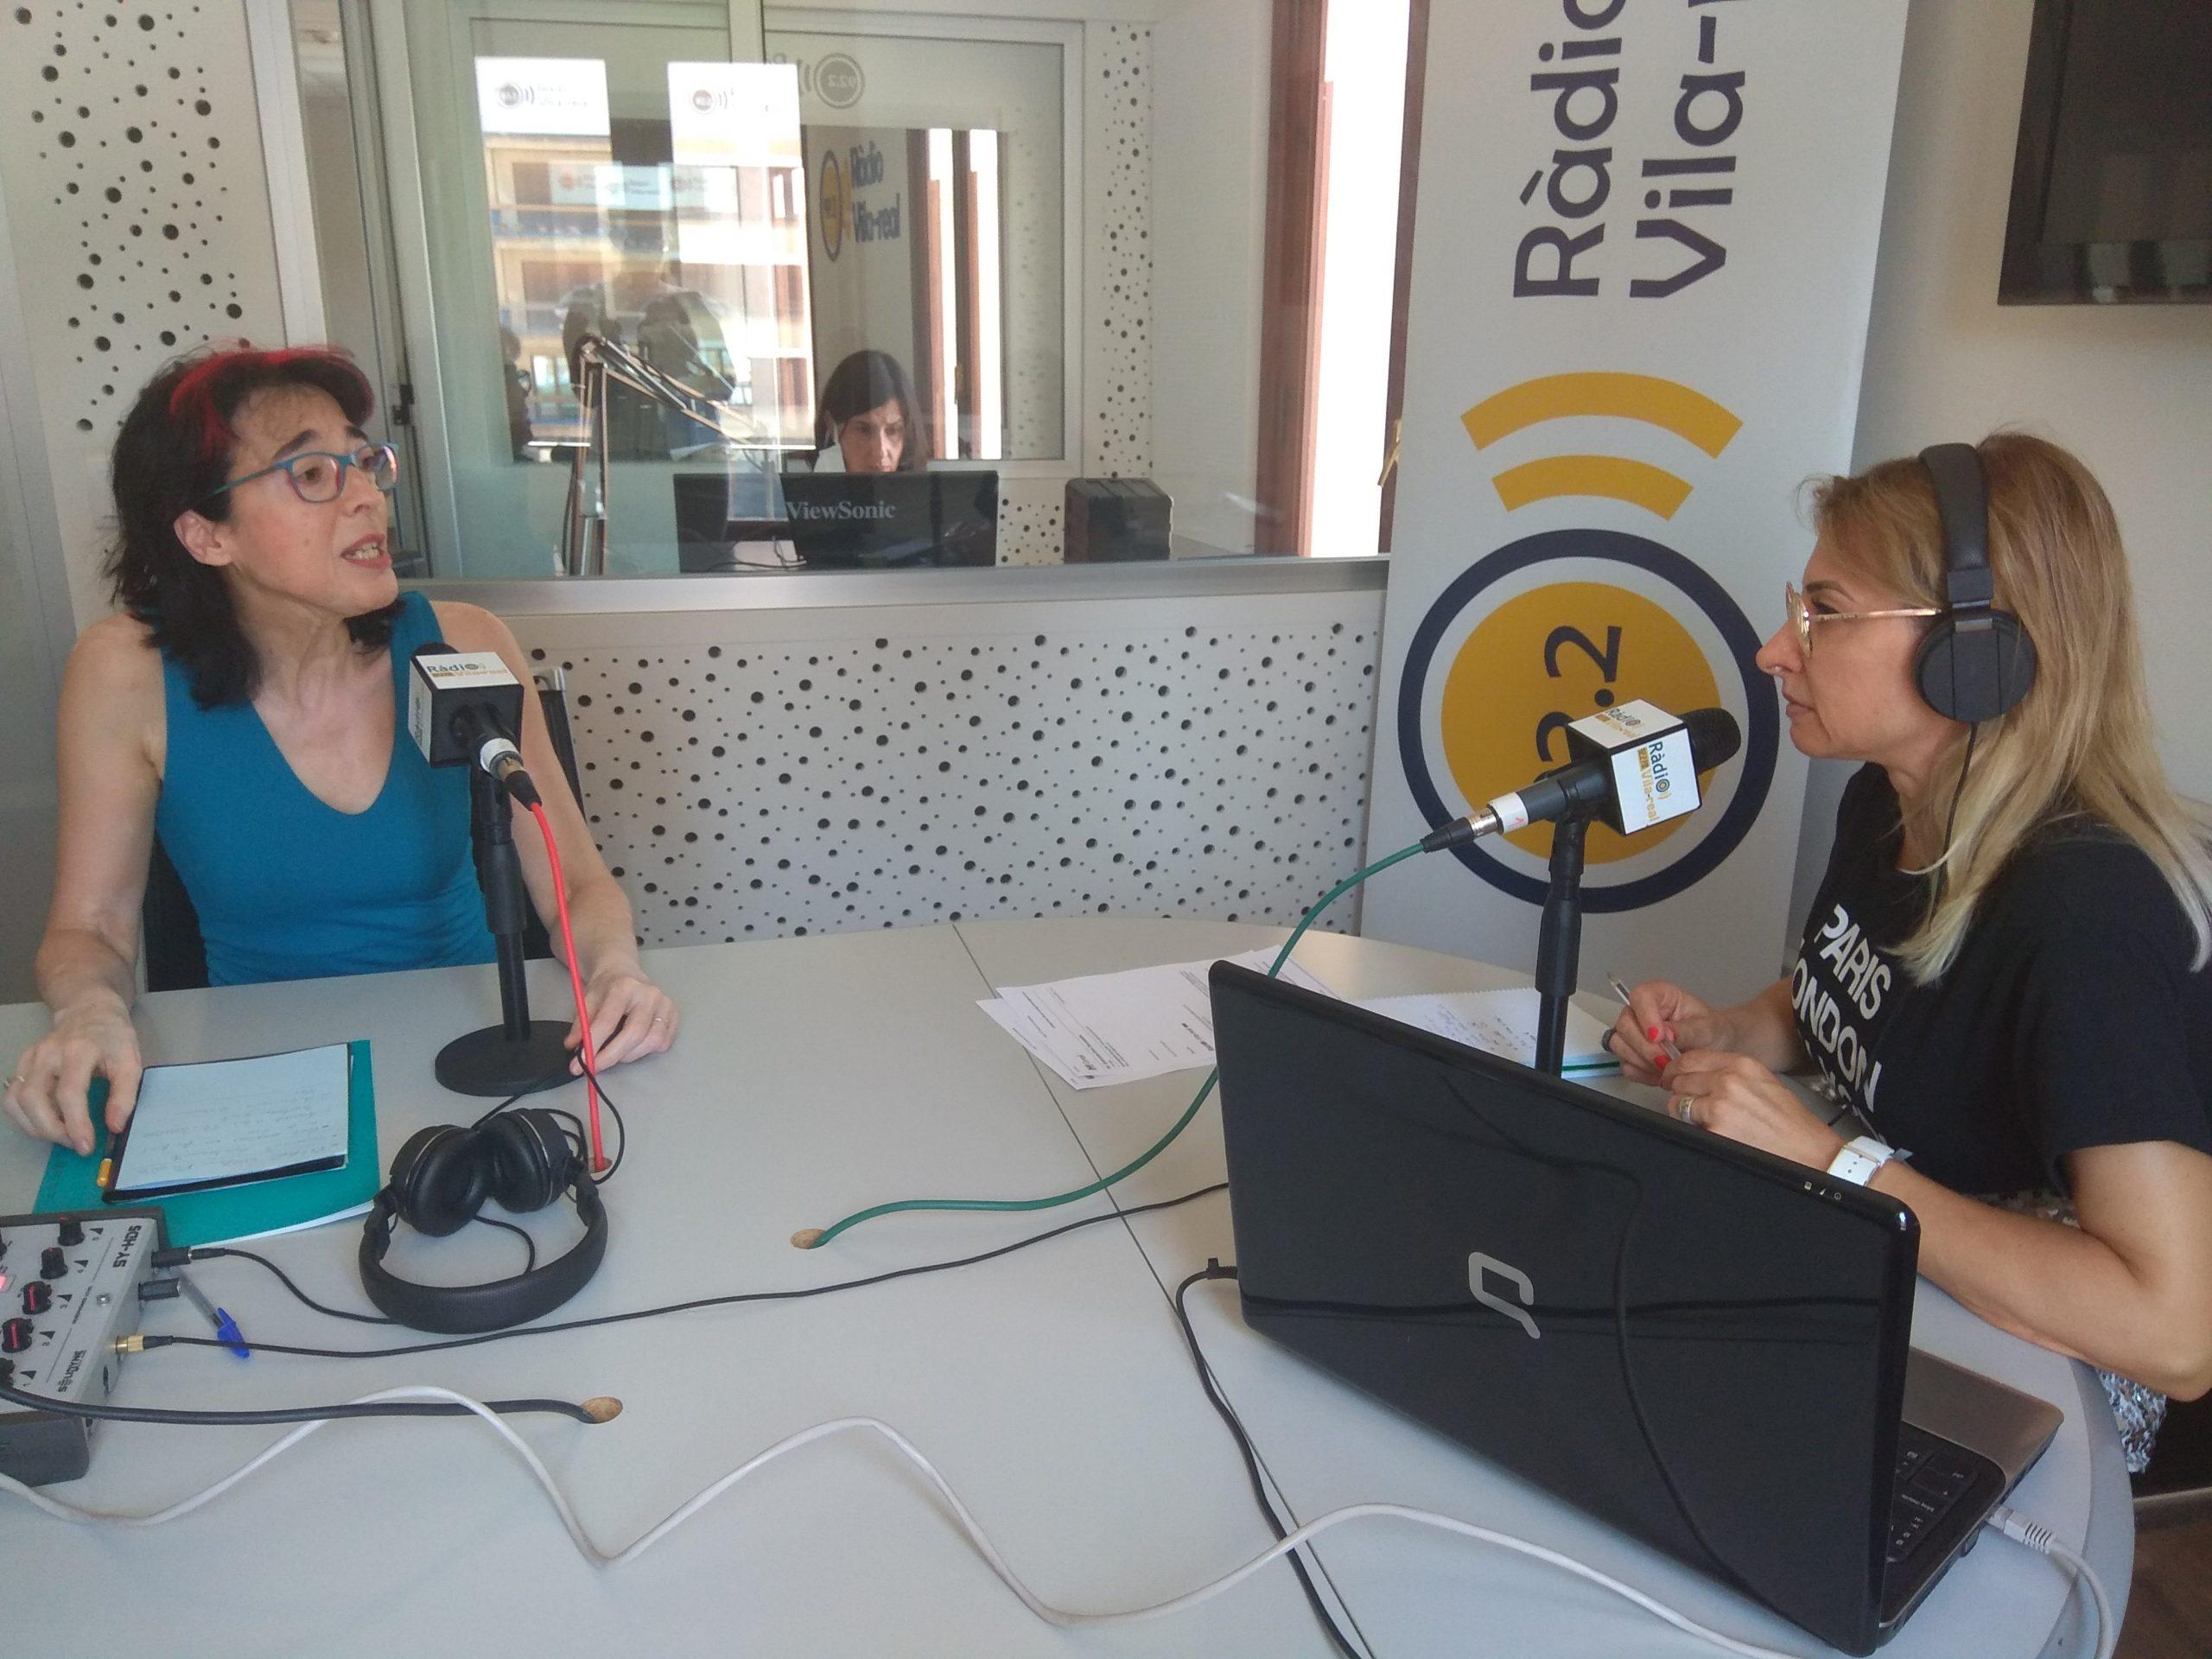 Entrevista a Marisa Saavedra, diputada nacional de Unidas Podemos